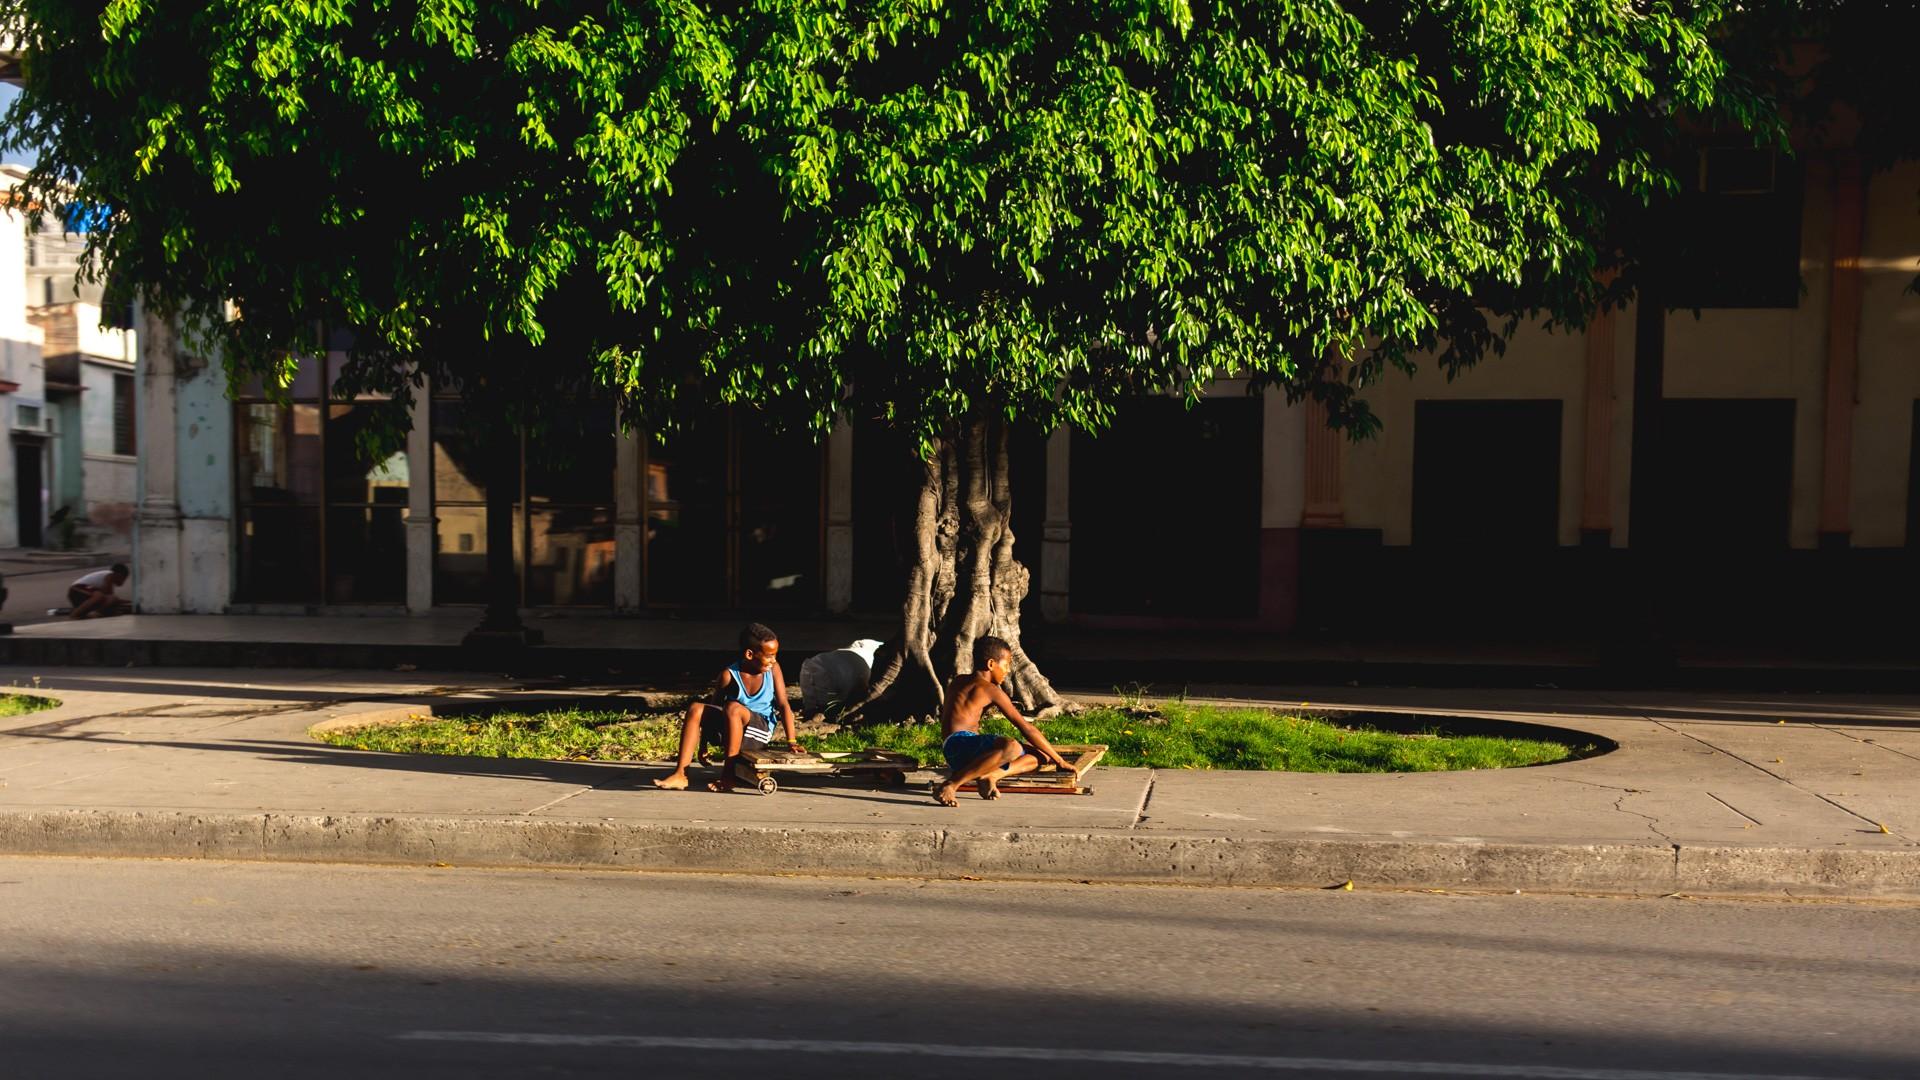 Damien-Dohmen-Photographe-Cuba-43